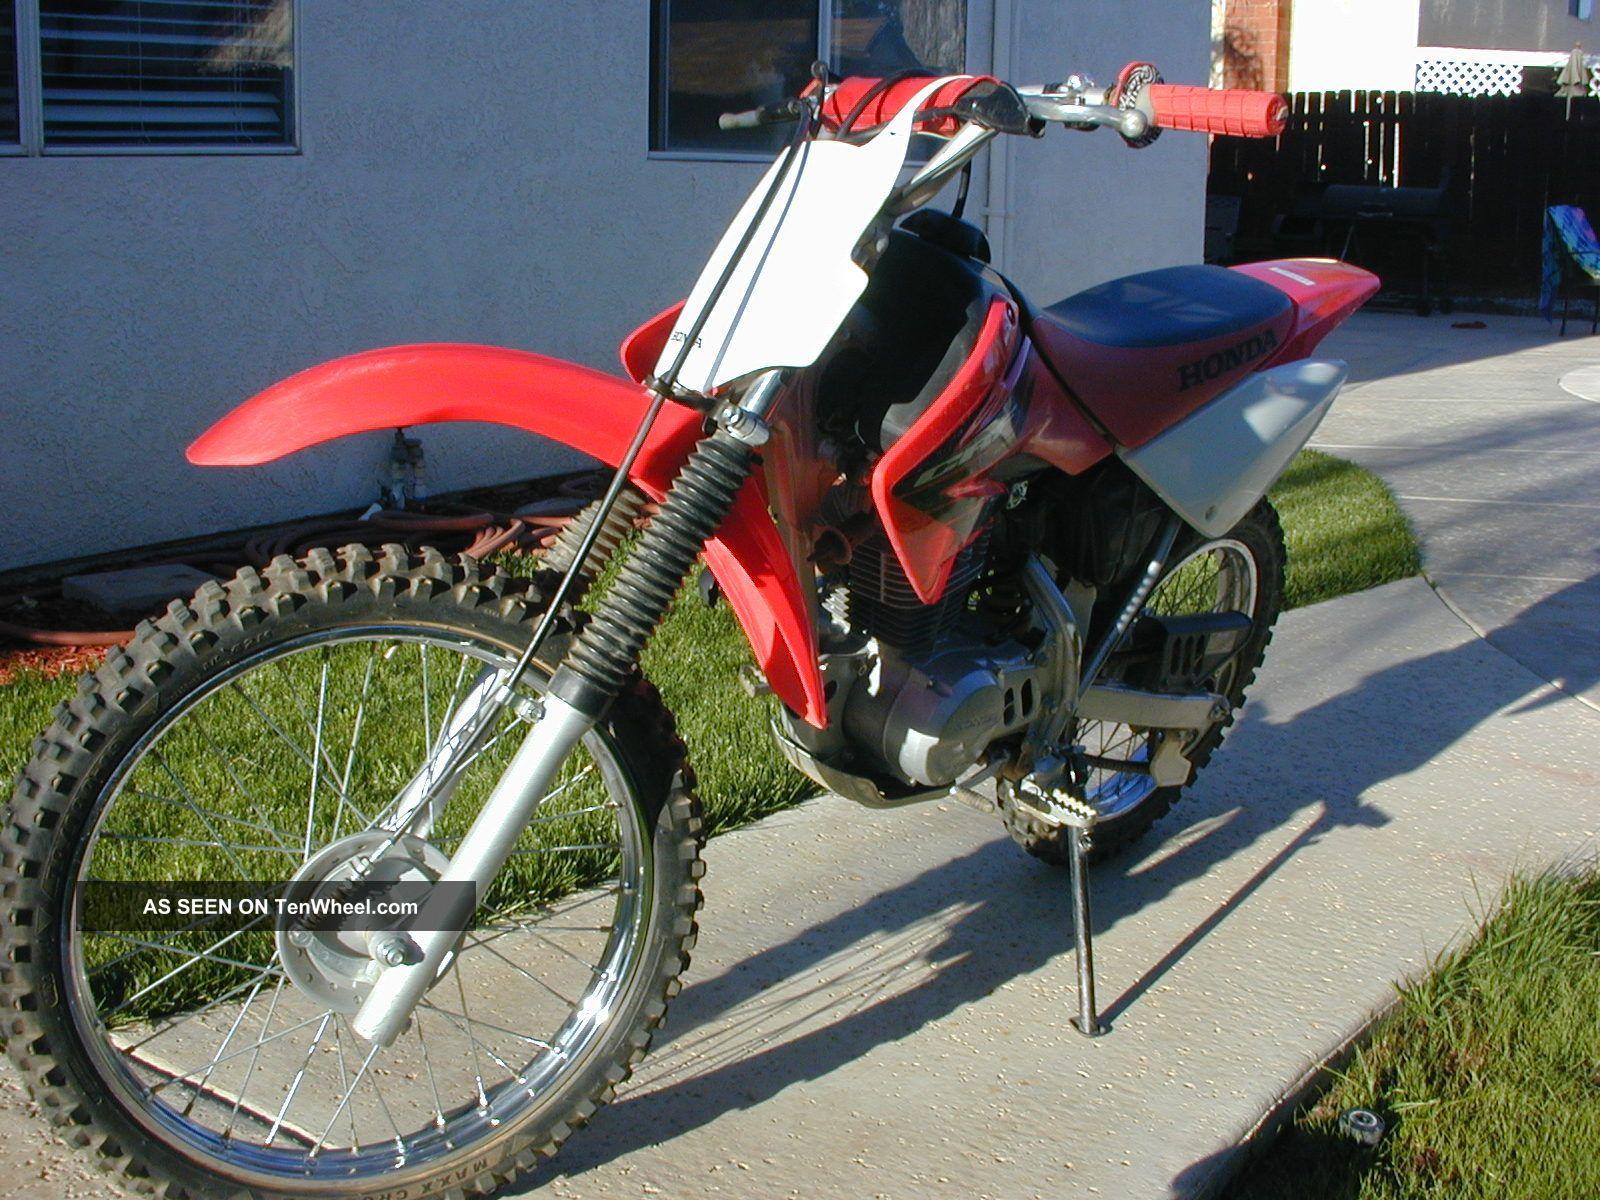 2004 Honda Crf 100 CRF photo